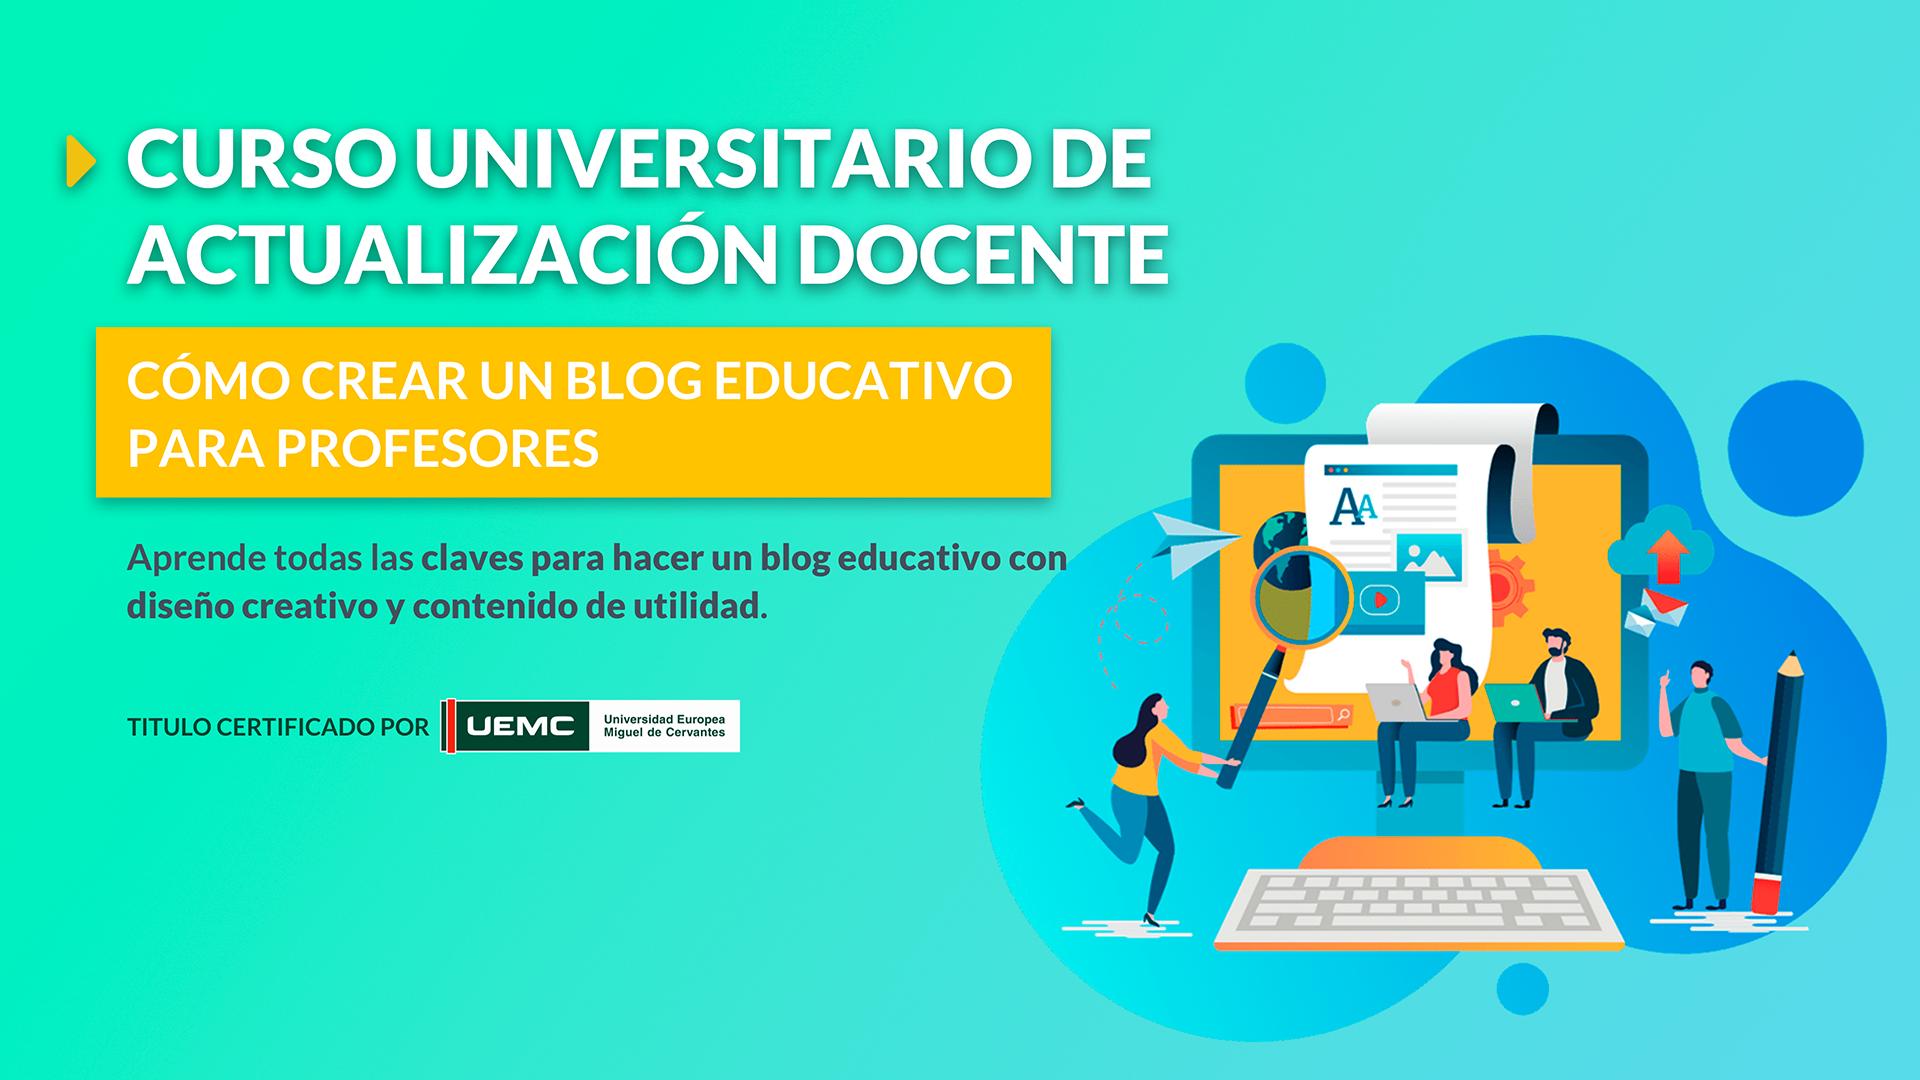 Cursos Universitarios de Actualización Docente: Cómo crear un blog educativo para profesores